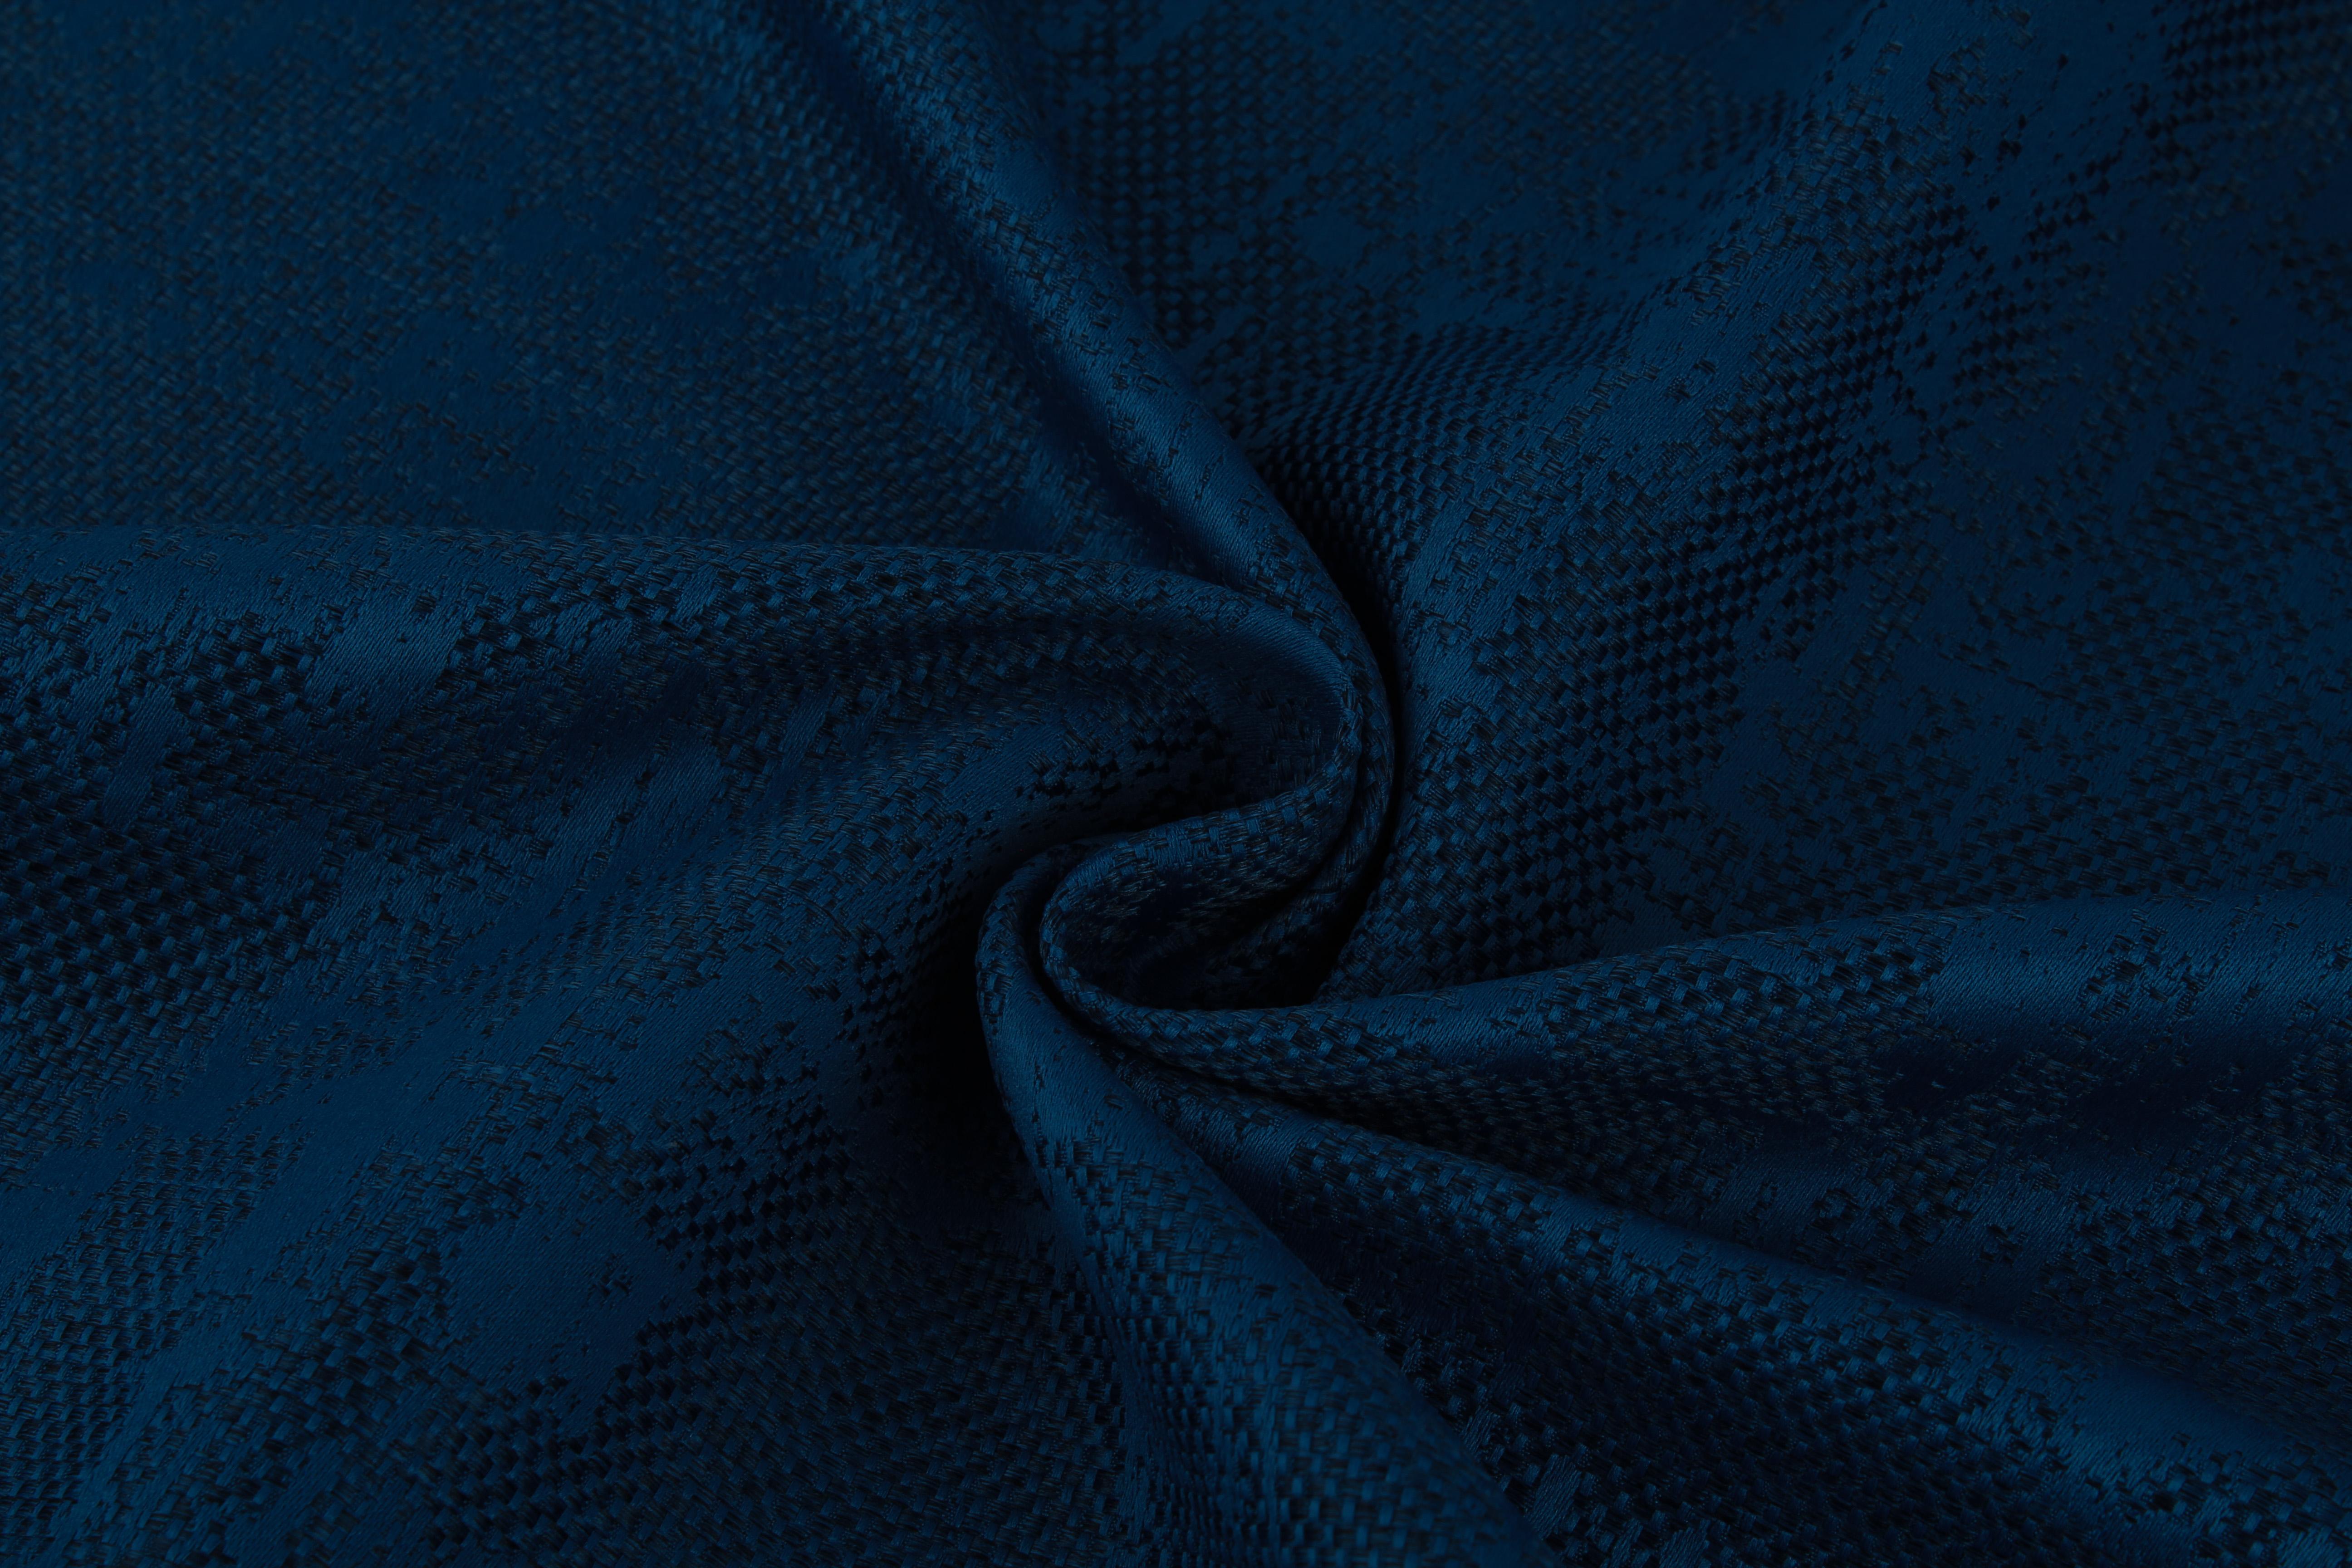 Купить Ткани TexRepublic, Материал Жаккард Japanese Motive Цвет: Синий, Турция